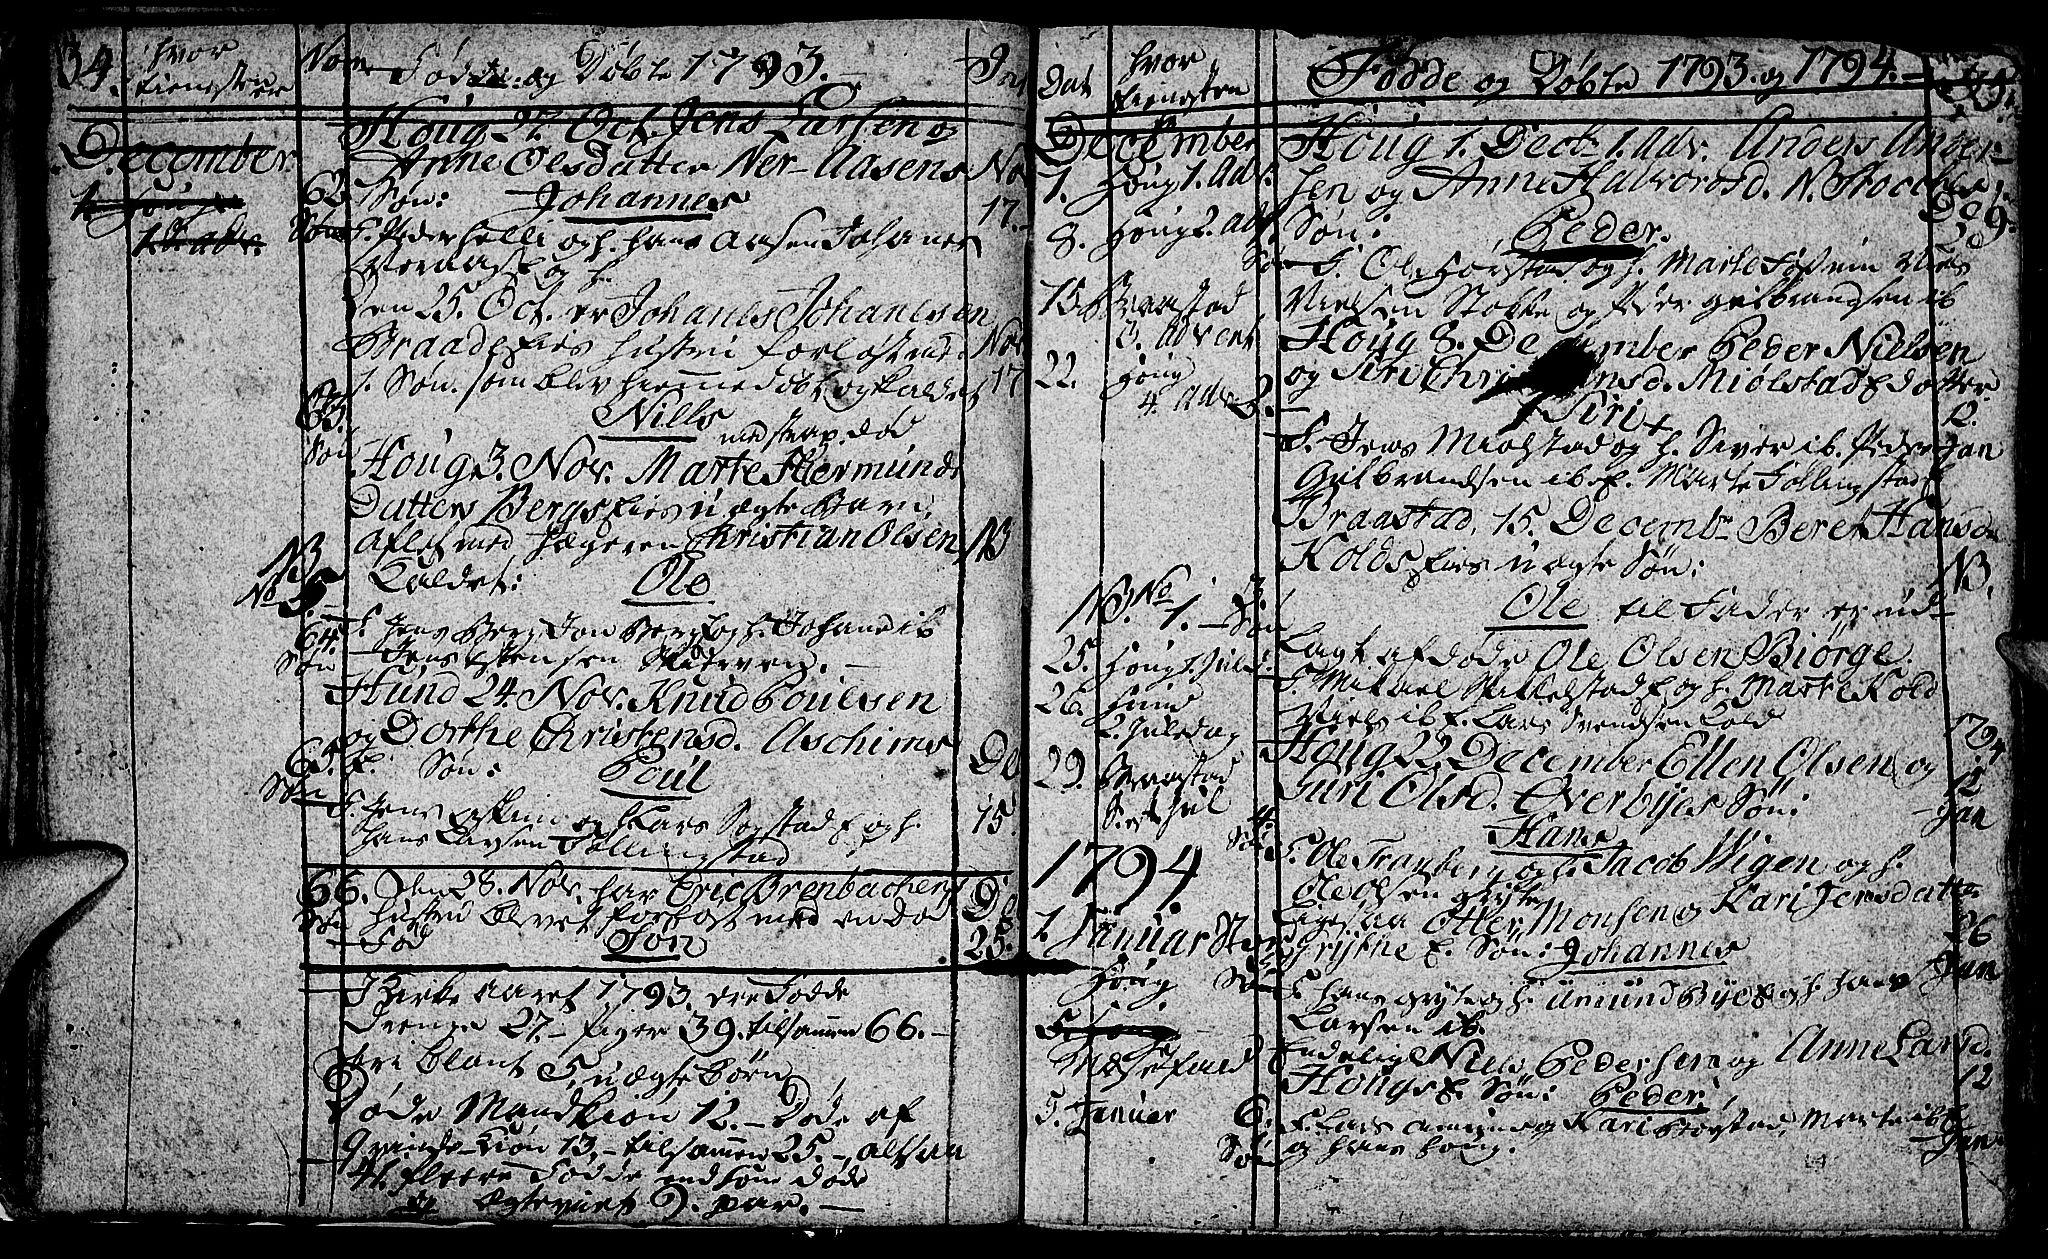 SAH, Vardal prestekontor, H/Ha/Hab/L0002: Klokkerbok nr. 2, 1790-1803, s. 34-35